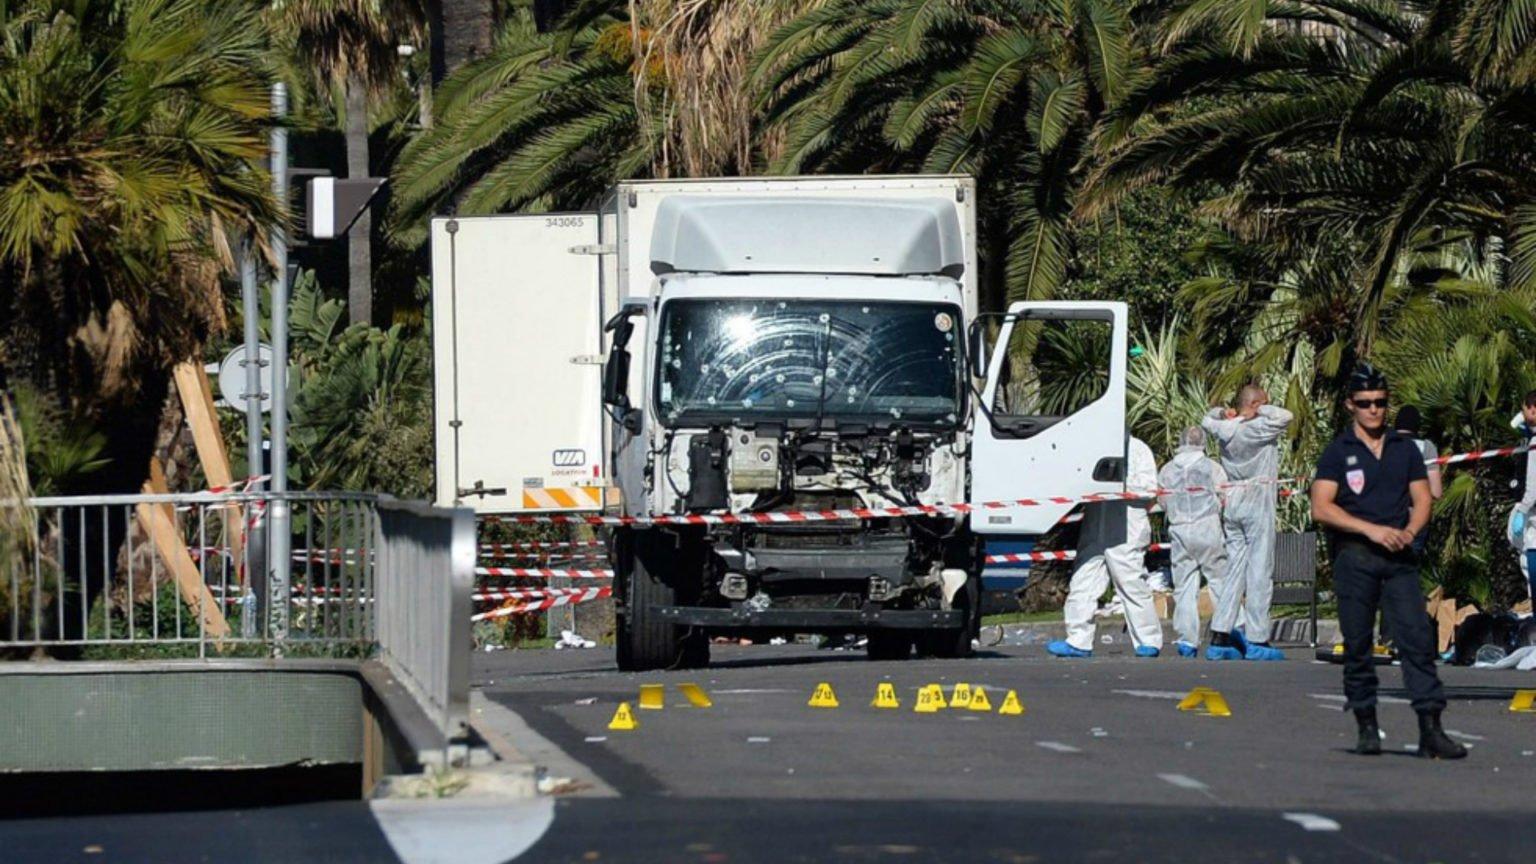 Suspect in Nice 2016 terrorist attack arrested in Italy